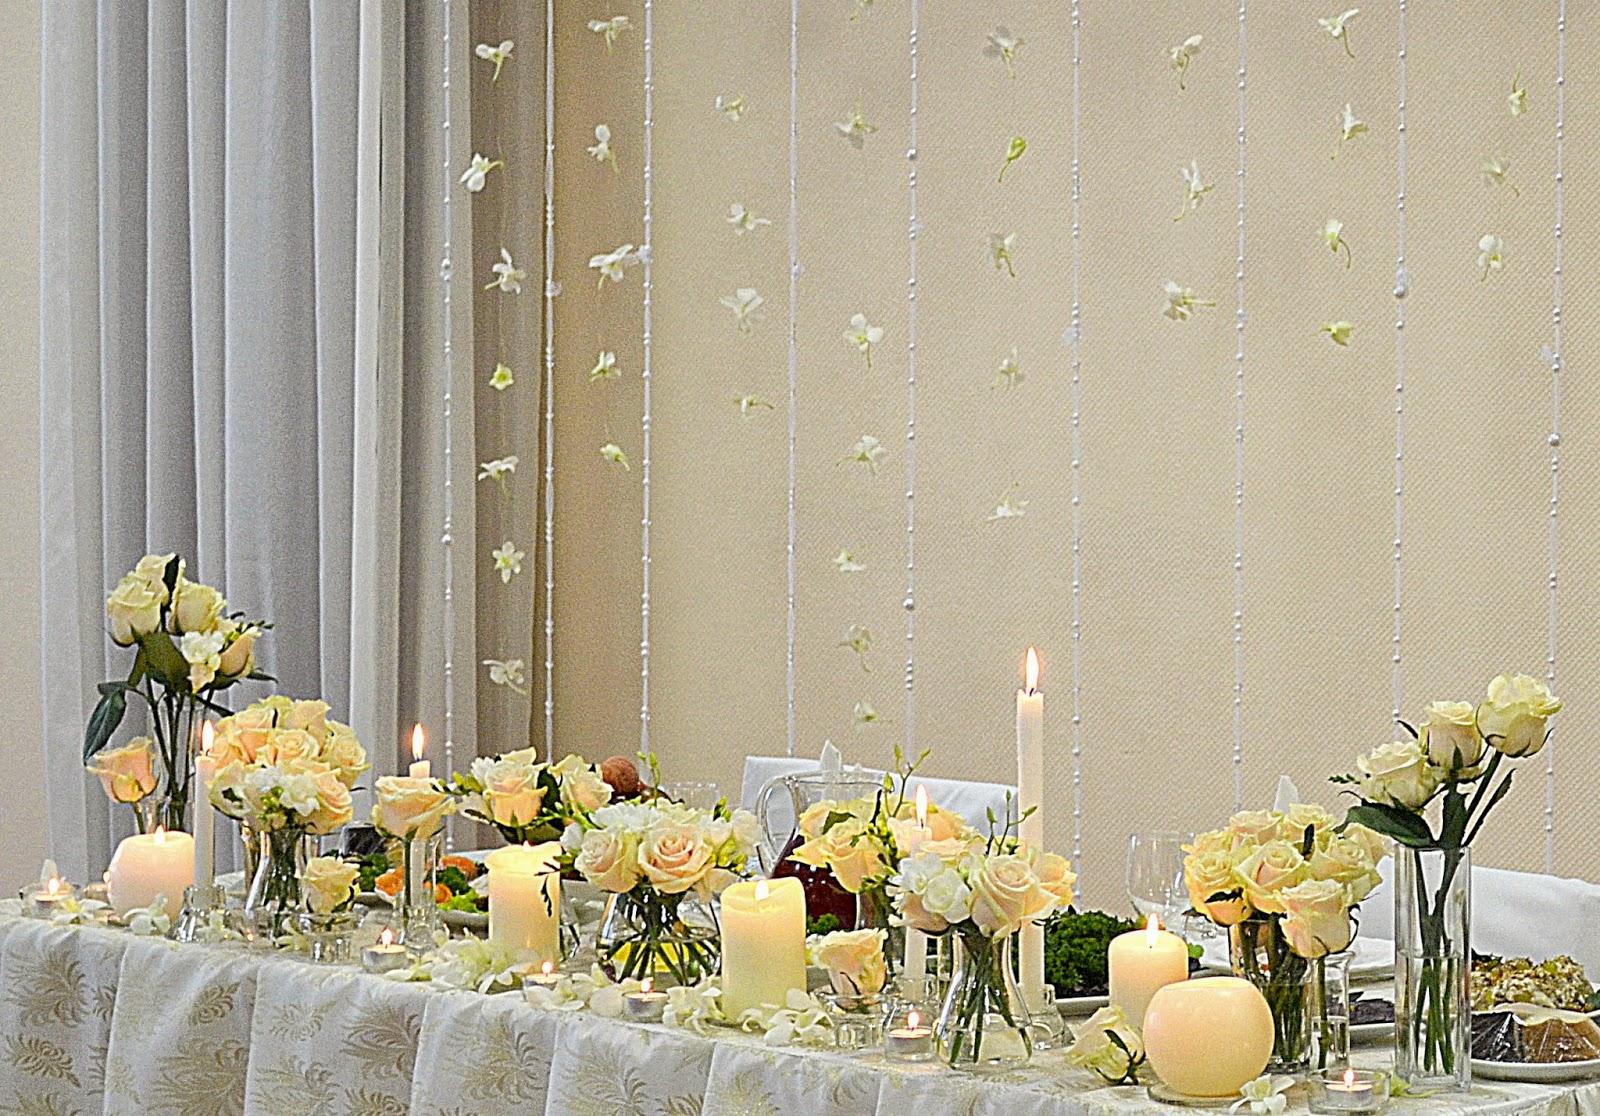 декор свадебного стола цветами